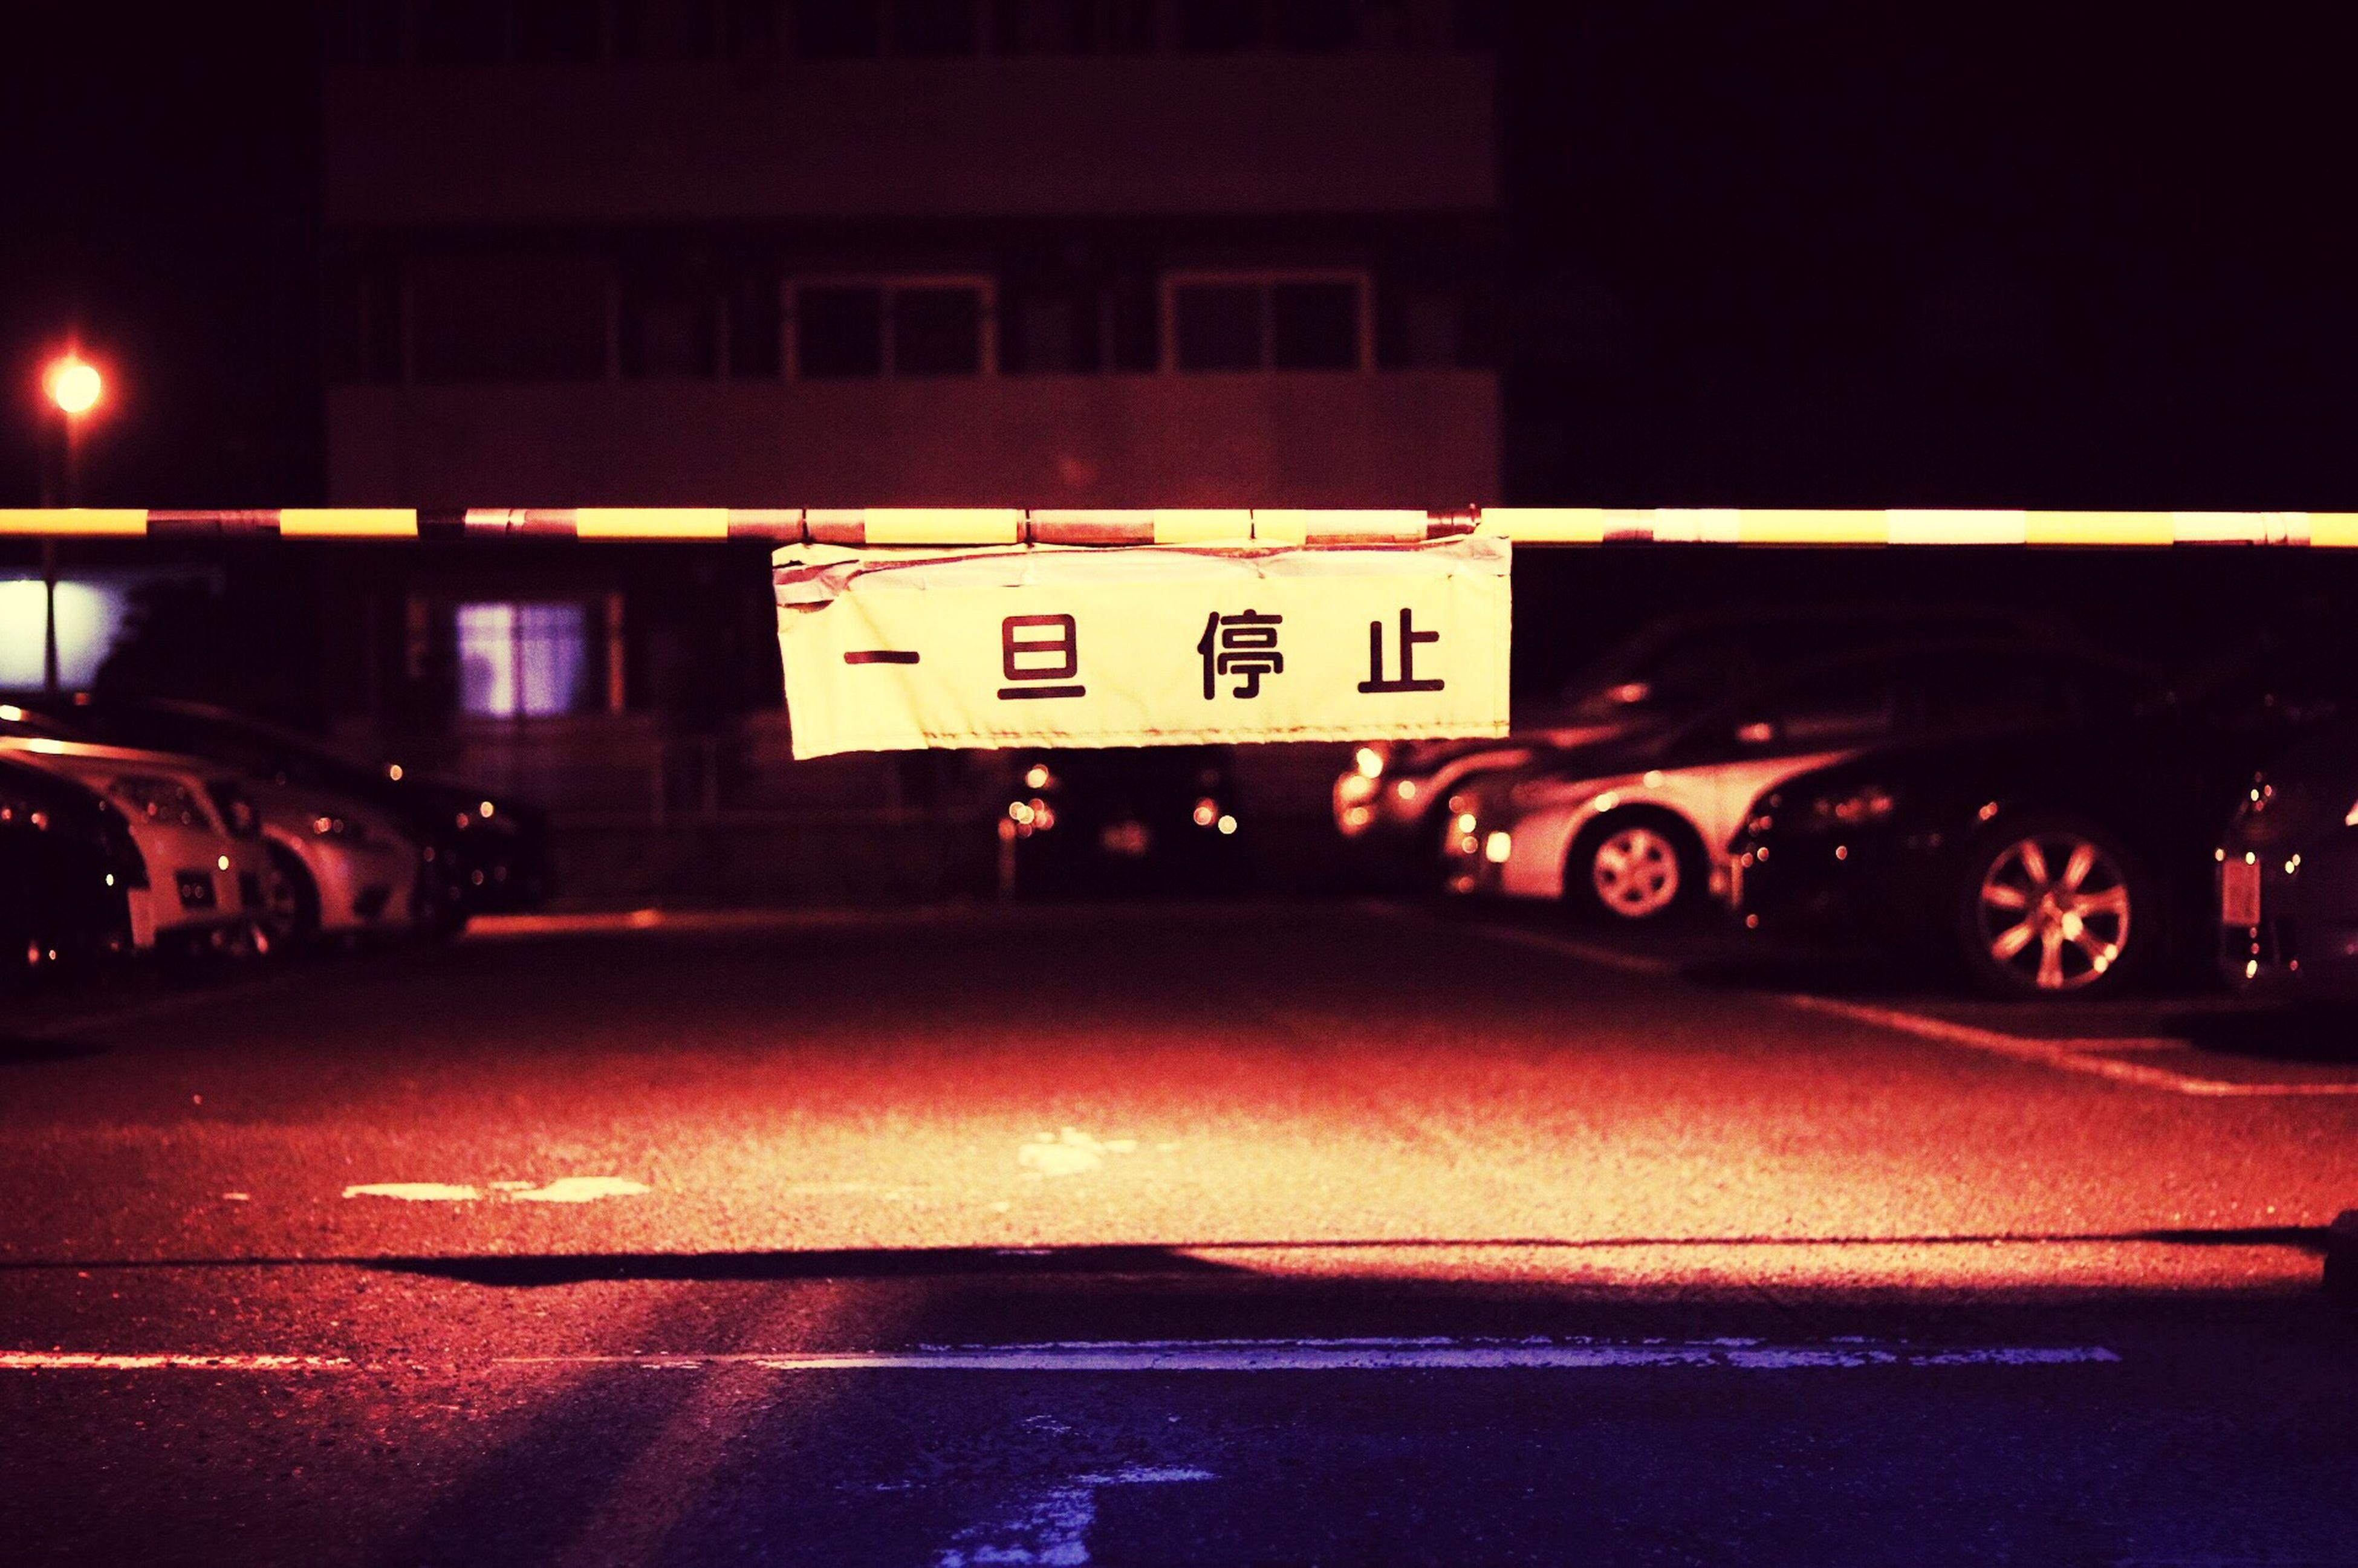 transportation, mode of transport, land vehicle, illuminated, on the move, night, road, public transportation, bus, windshield, journey, information sign, no people